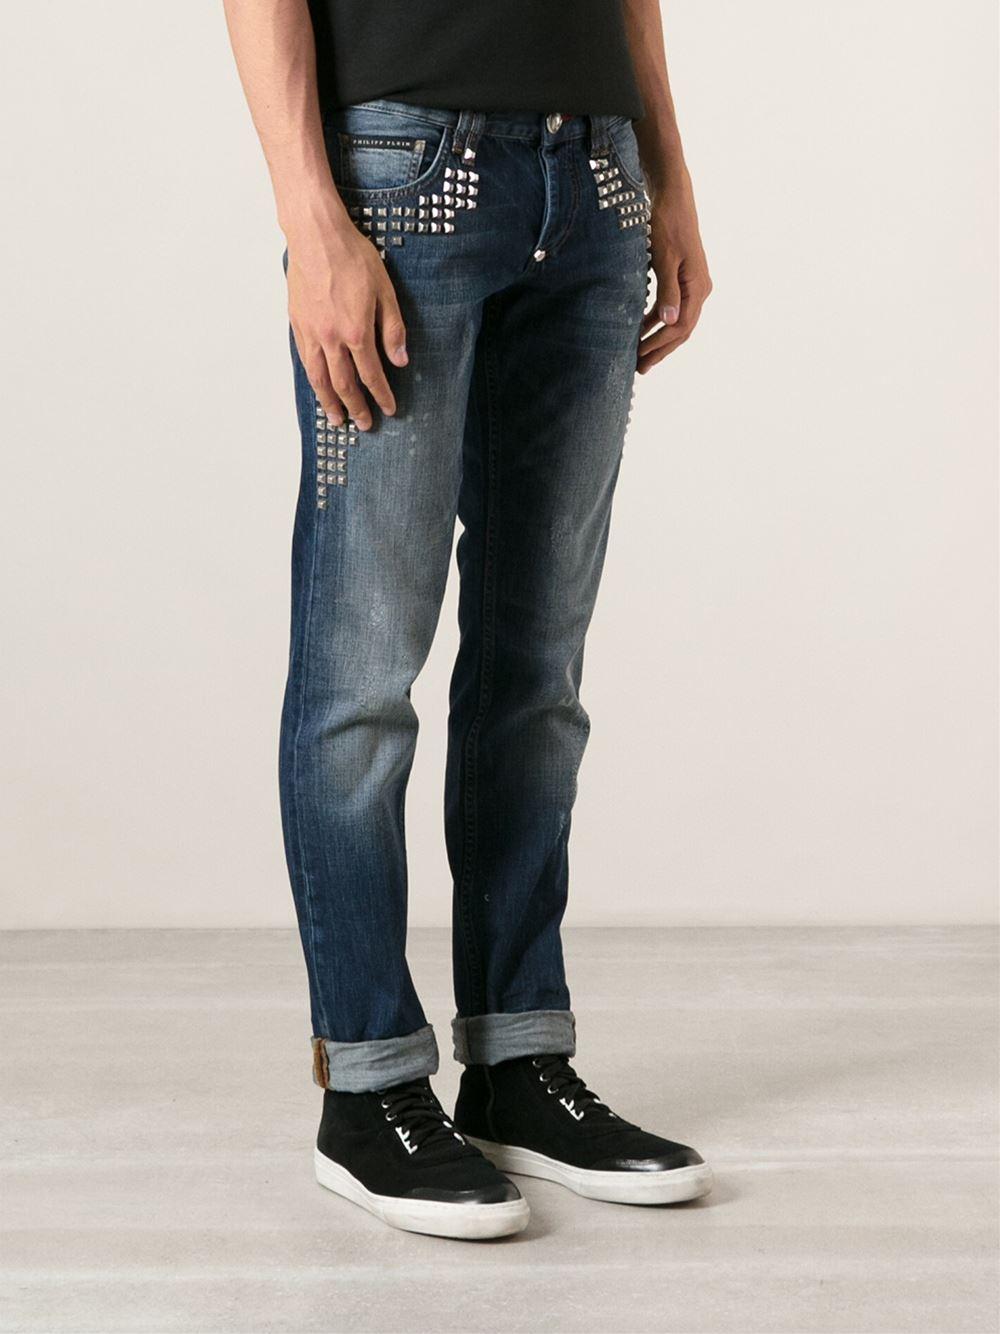 philipp plein studded slim fit jeans in blue for men lyst. Black Bedroom Furniture Sets. Home Design Ideas